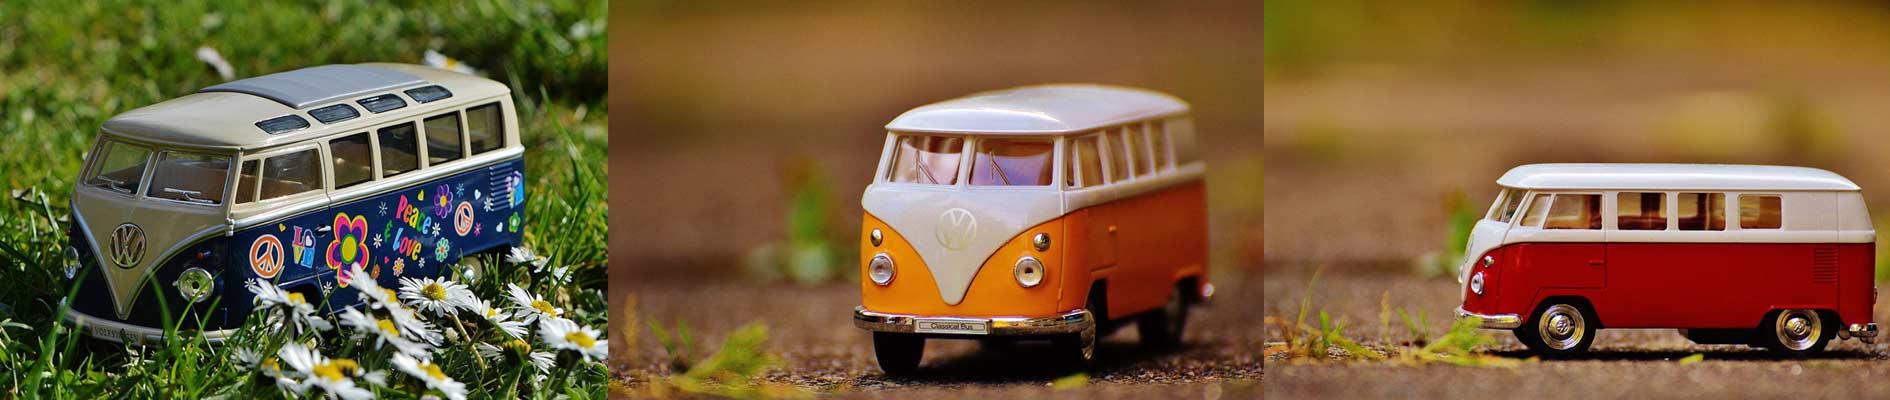 la conduite et le permis en angleterre campingcar online. Black Bedroom Furniture Sets. Home Design Ideas